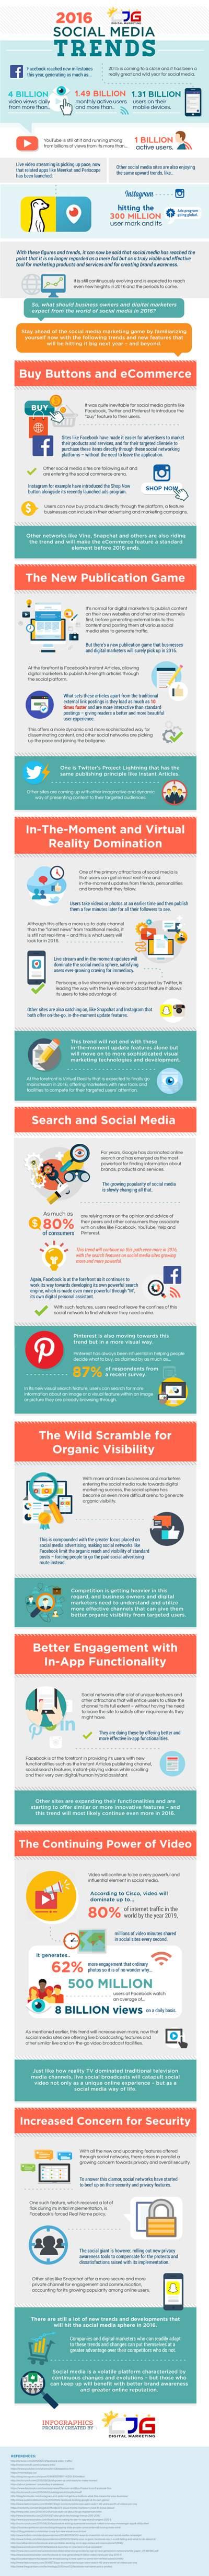 tendencias-social-media-2016-infografia